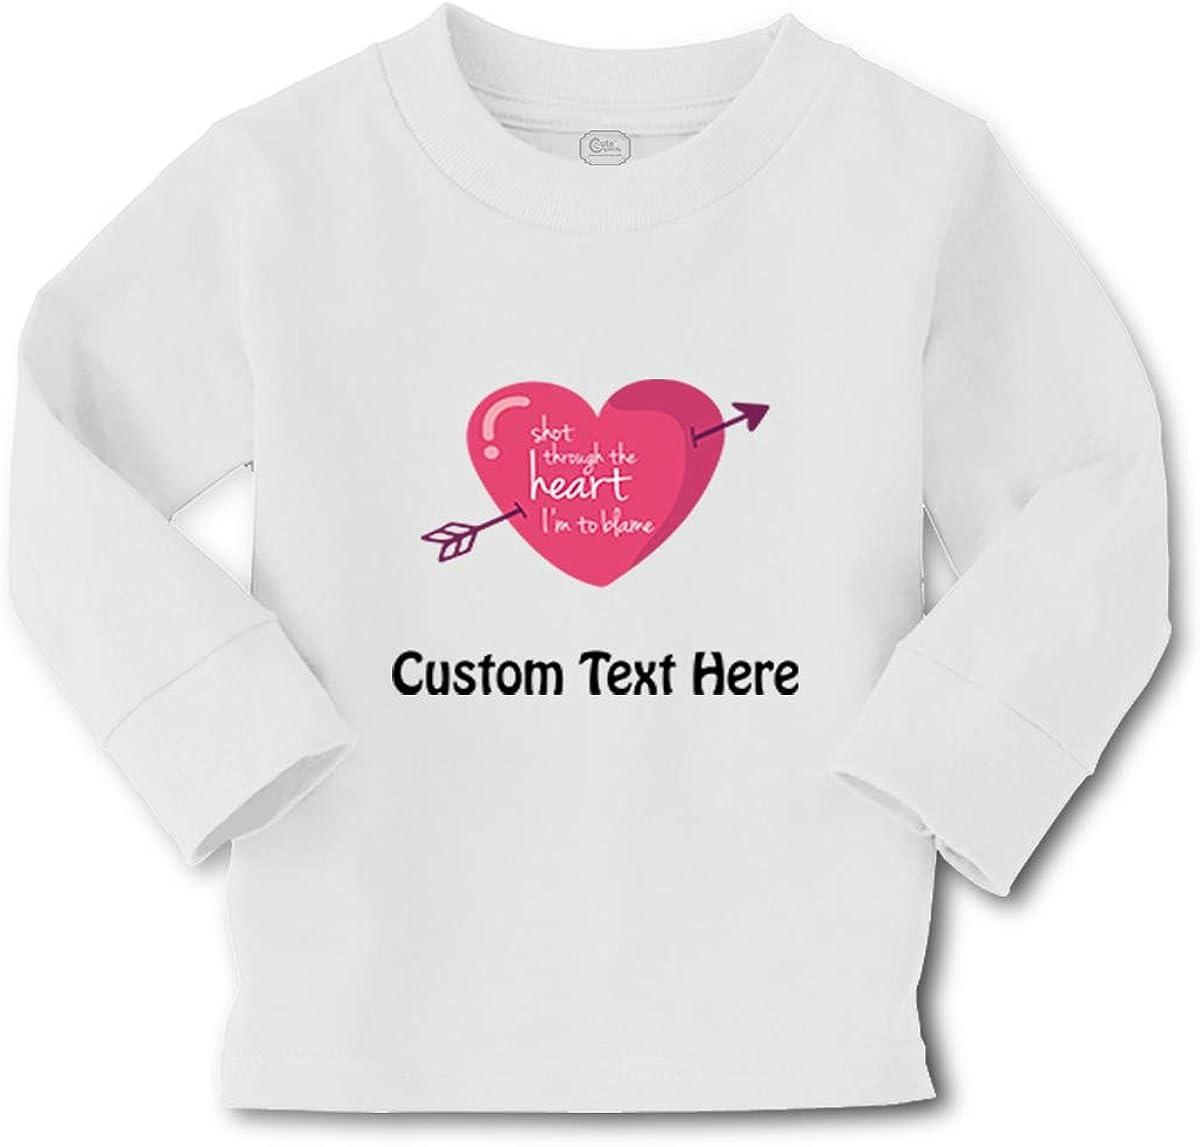 Kids Long Sleeve T Shirt Shot Through The Heart I'm to Blame Boy & Girl Clothes